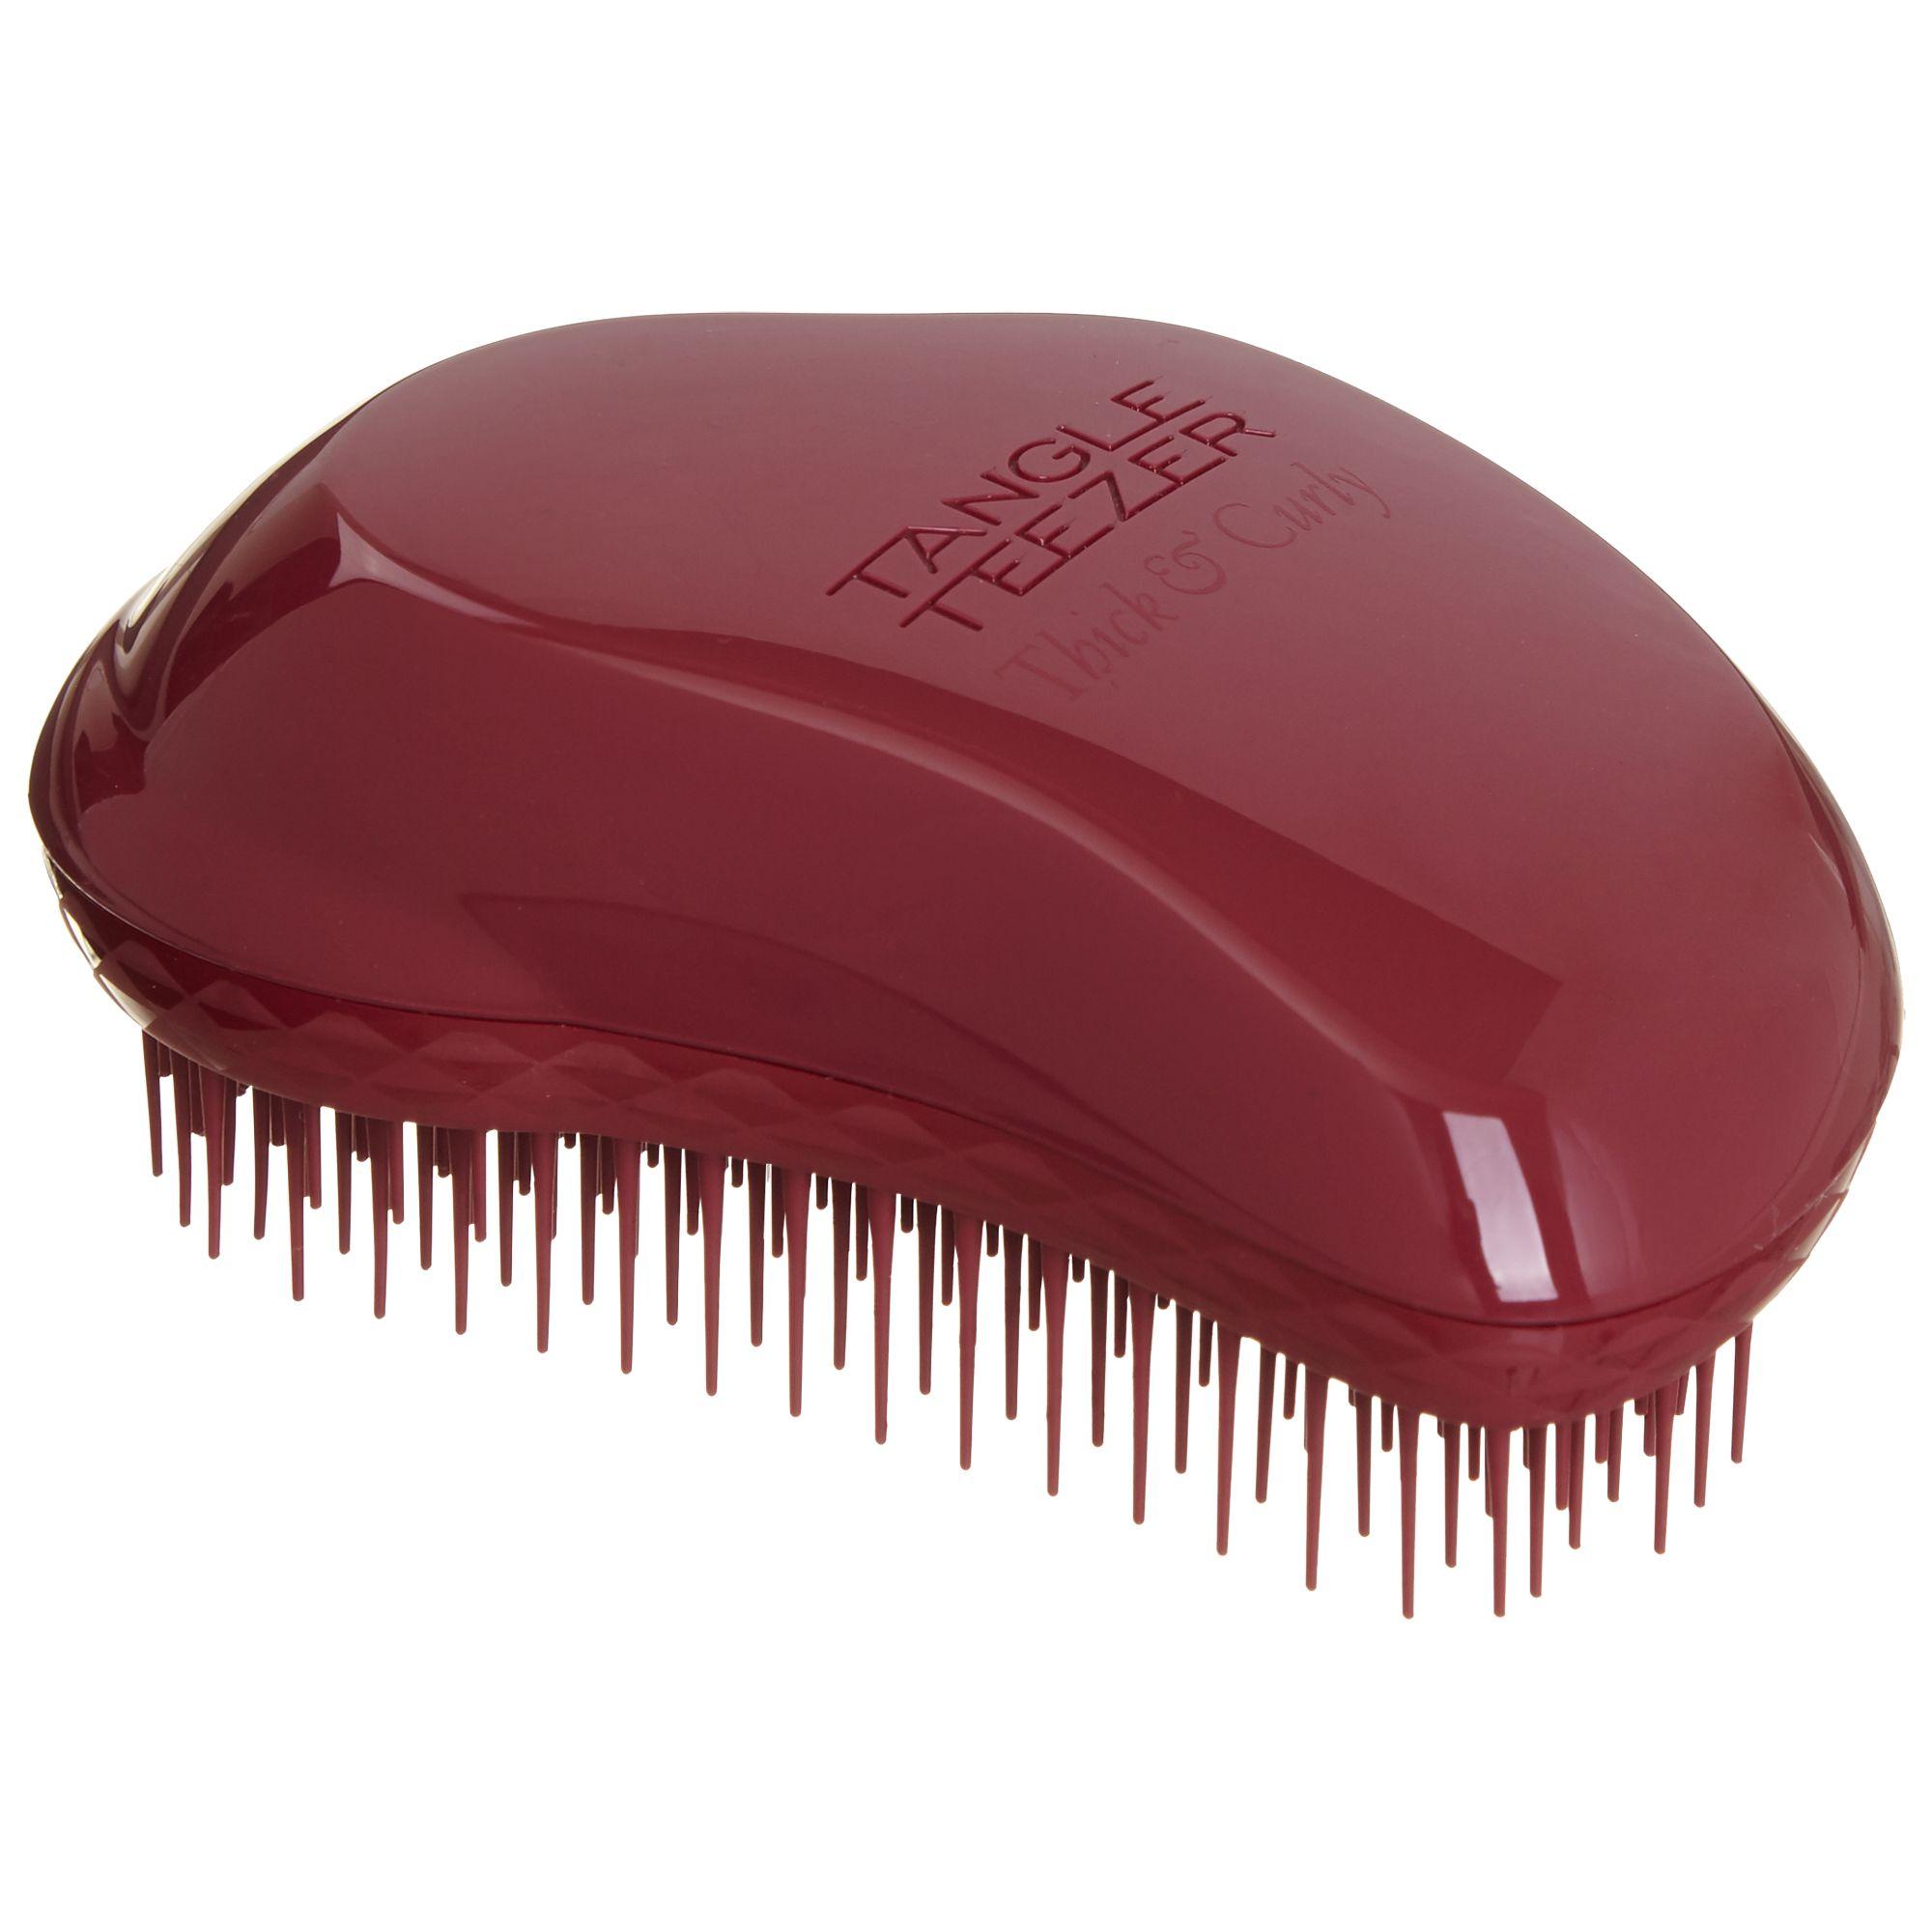 Tangle Teezer Tangle Teezer Thick & Curly Hair Brush